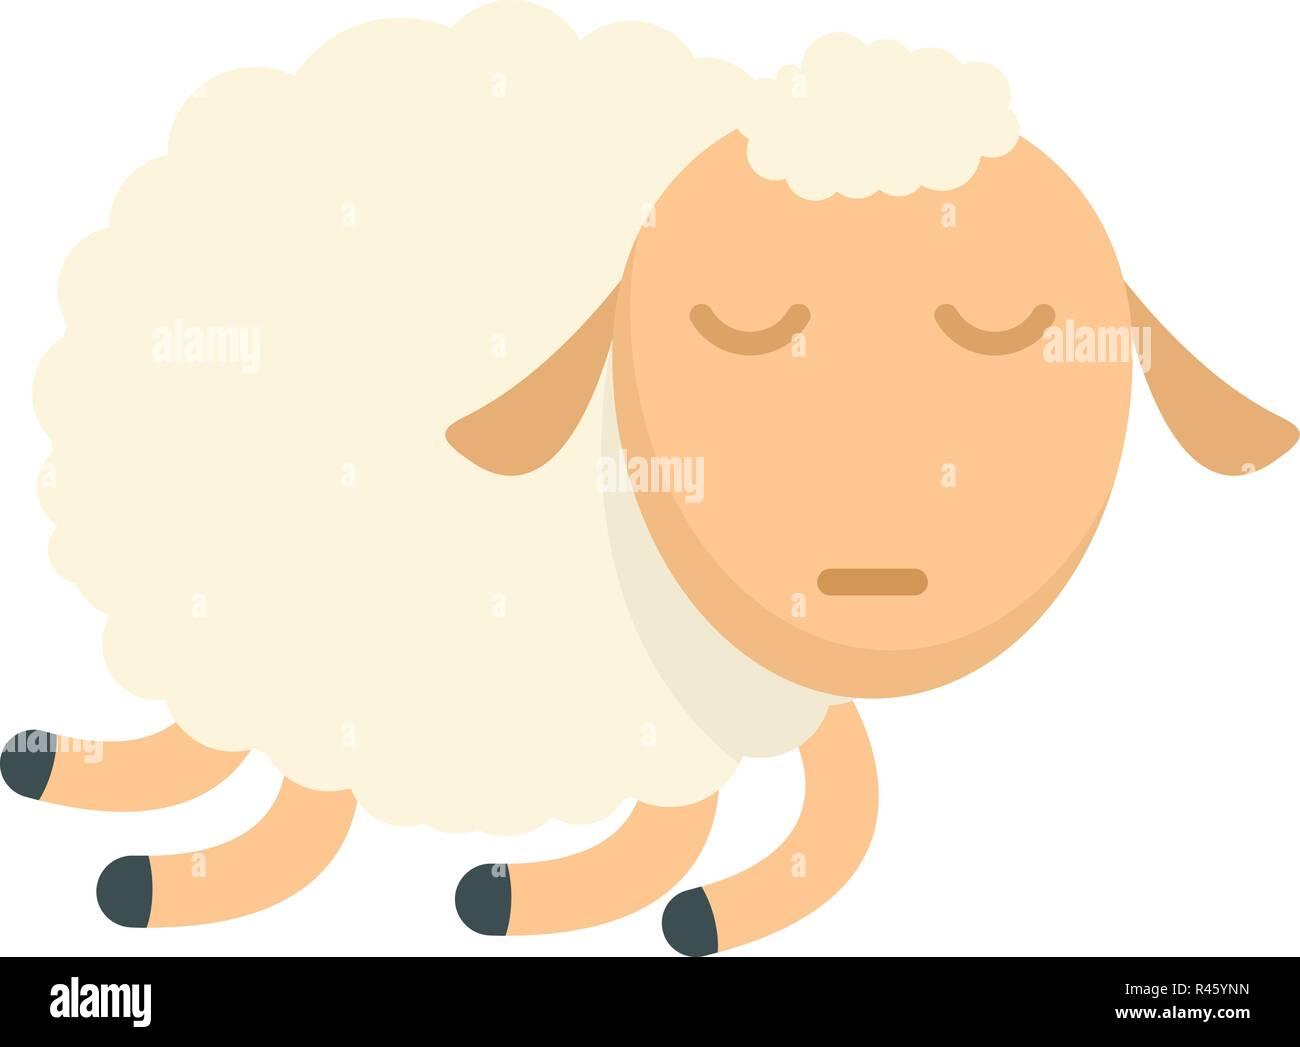 Sheep Cartoon Imágenes De Stock & Sheep Cartoon Fotos De Stock ...